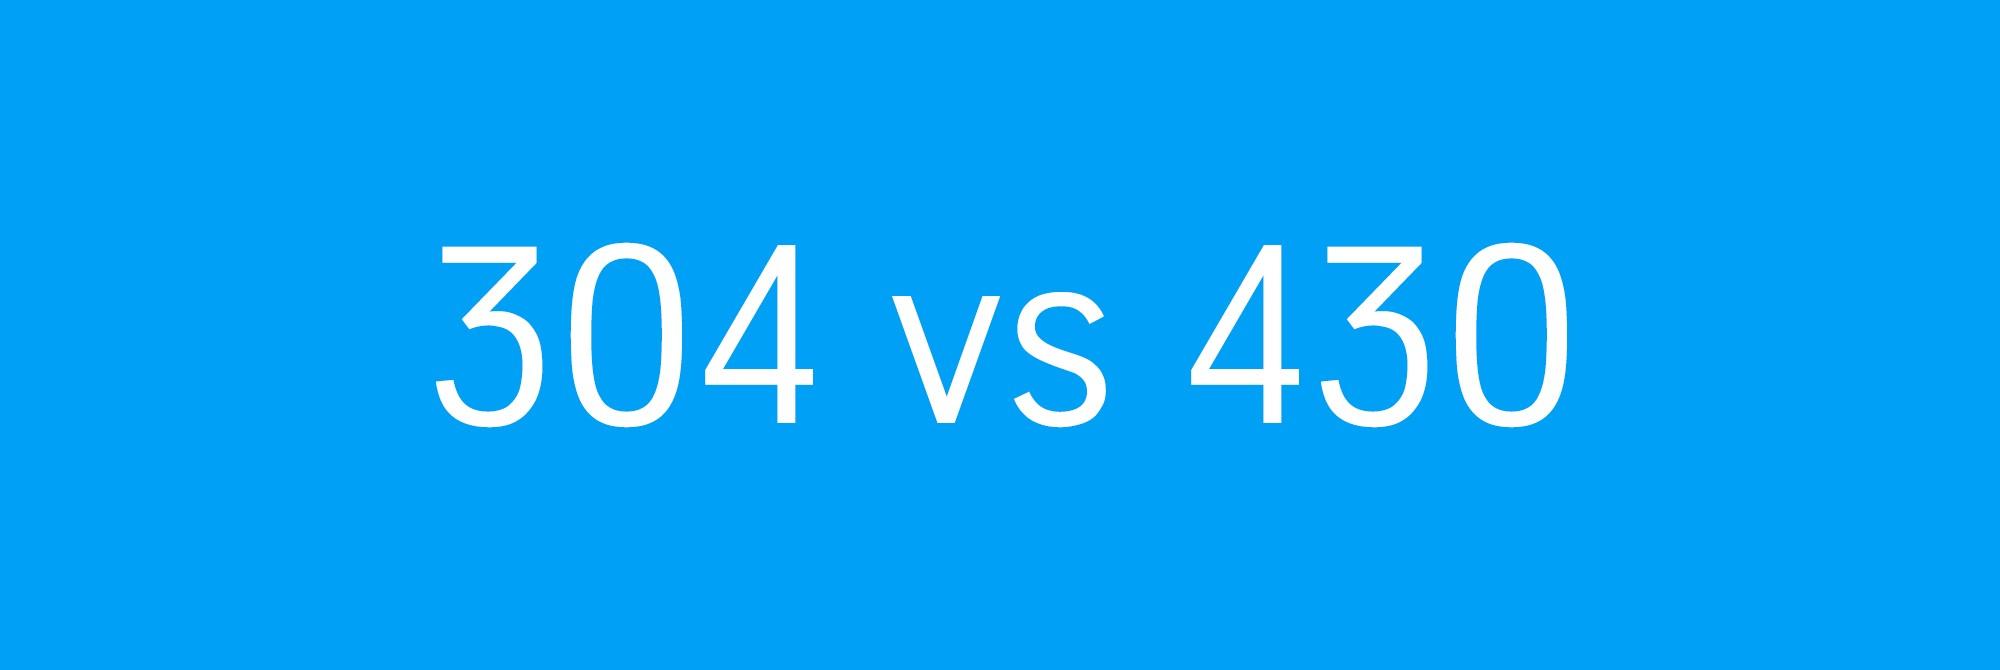 304 vs 430